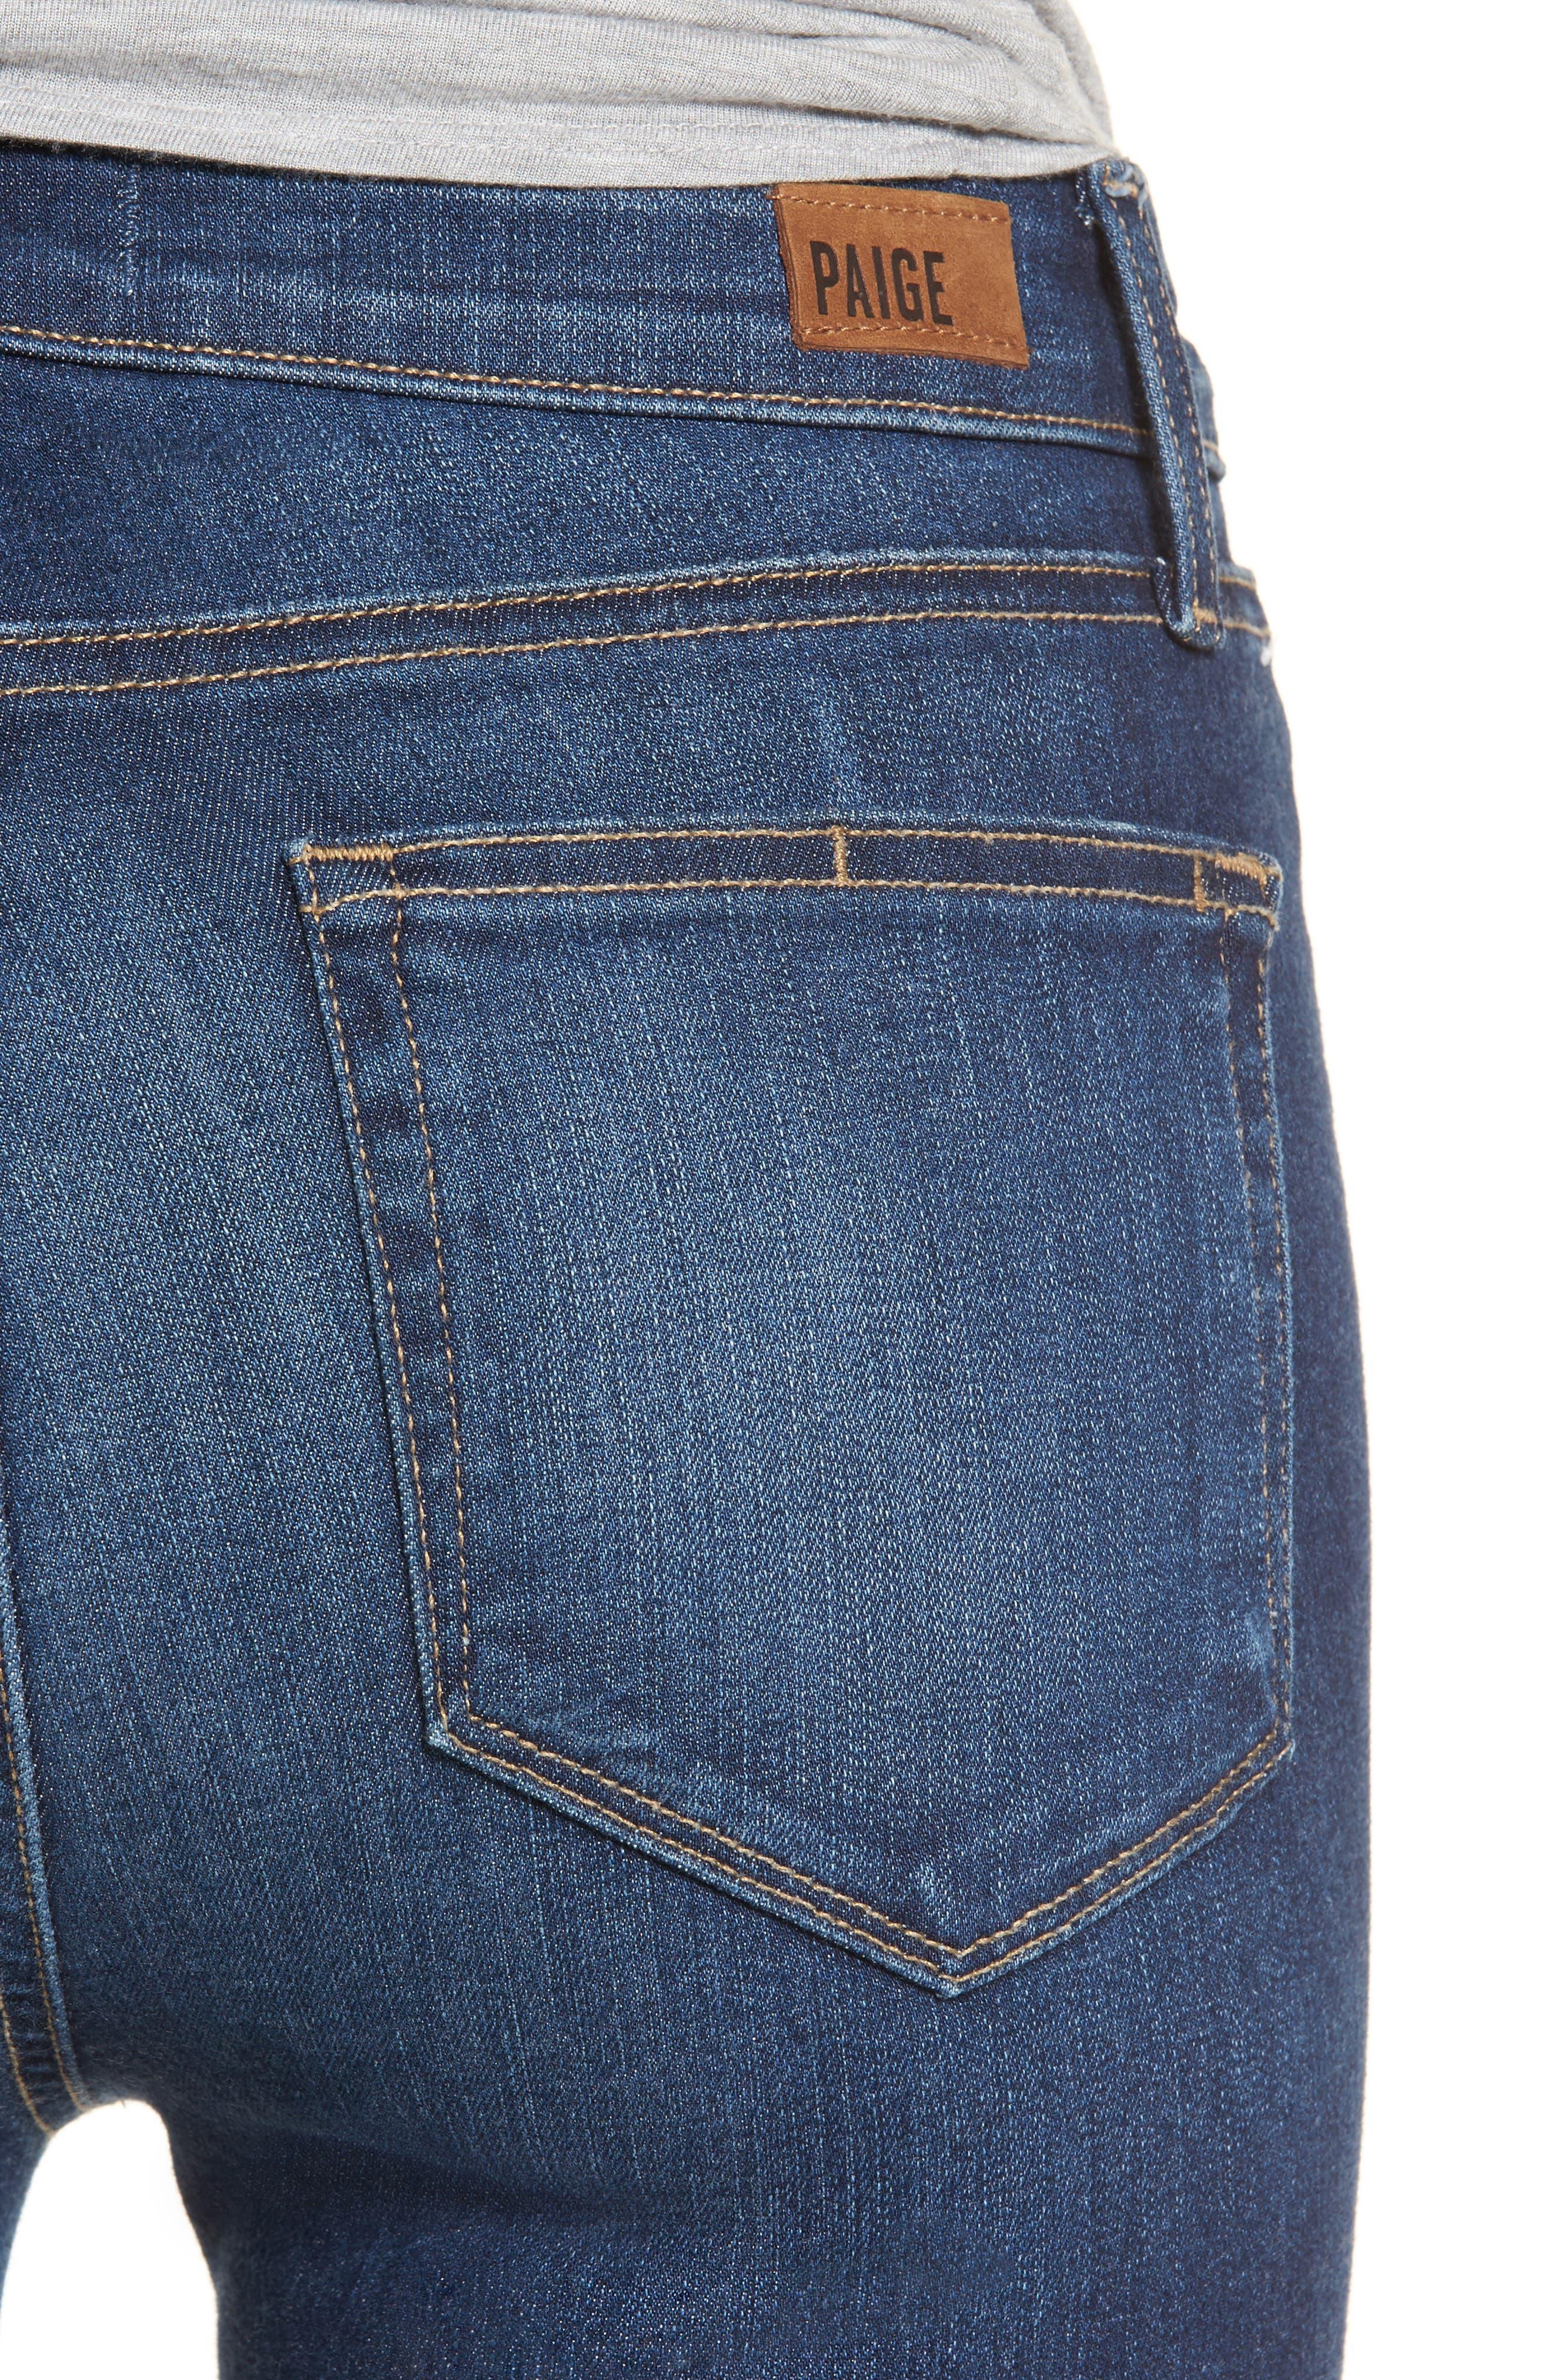 Transcend Vintage - Hoxton High Waist Ankle Skinny Jeans,                             Alternate thumbnail 4, color,